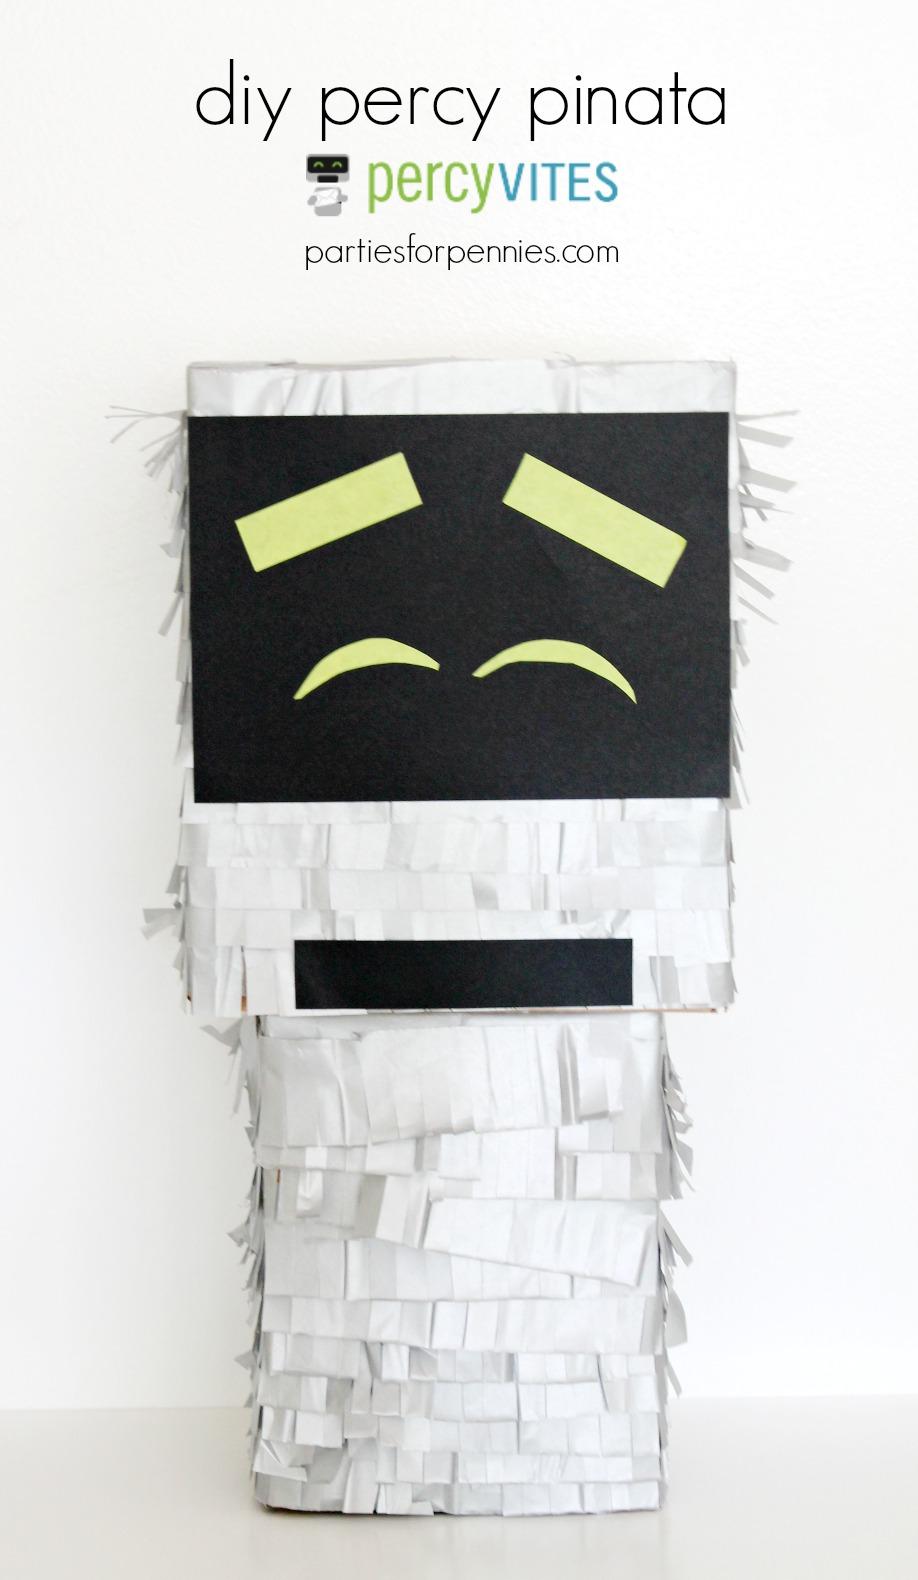 DIY Robot Pinata by PartiesforPennies.com